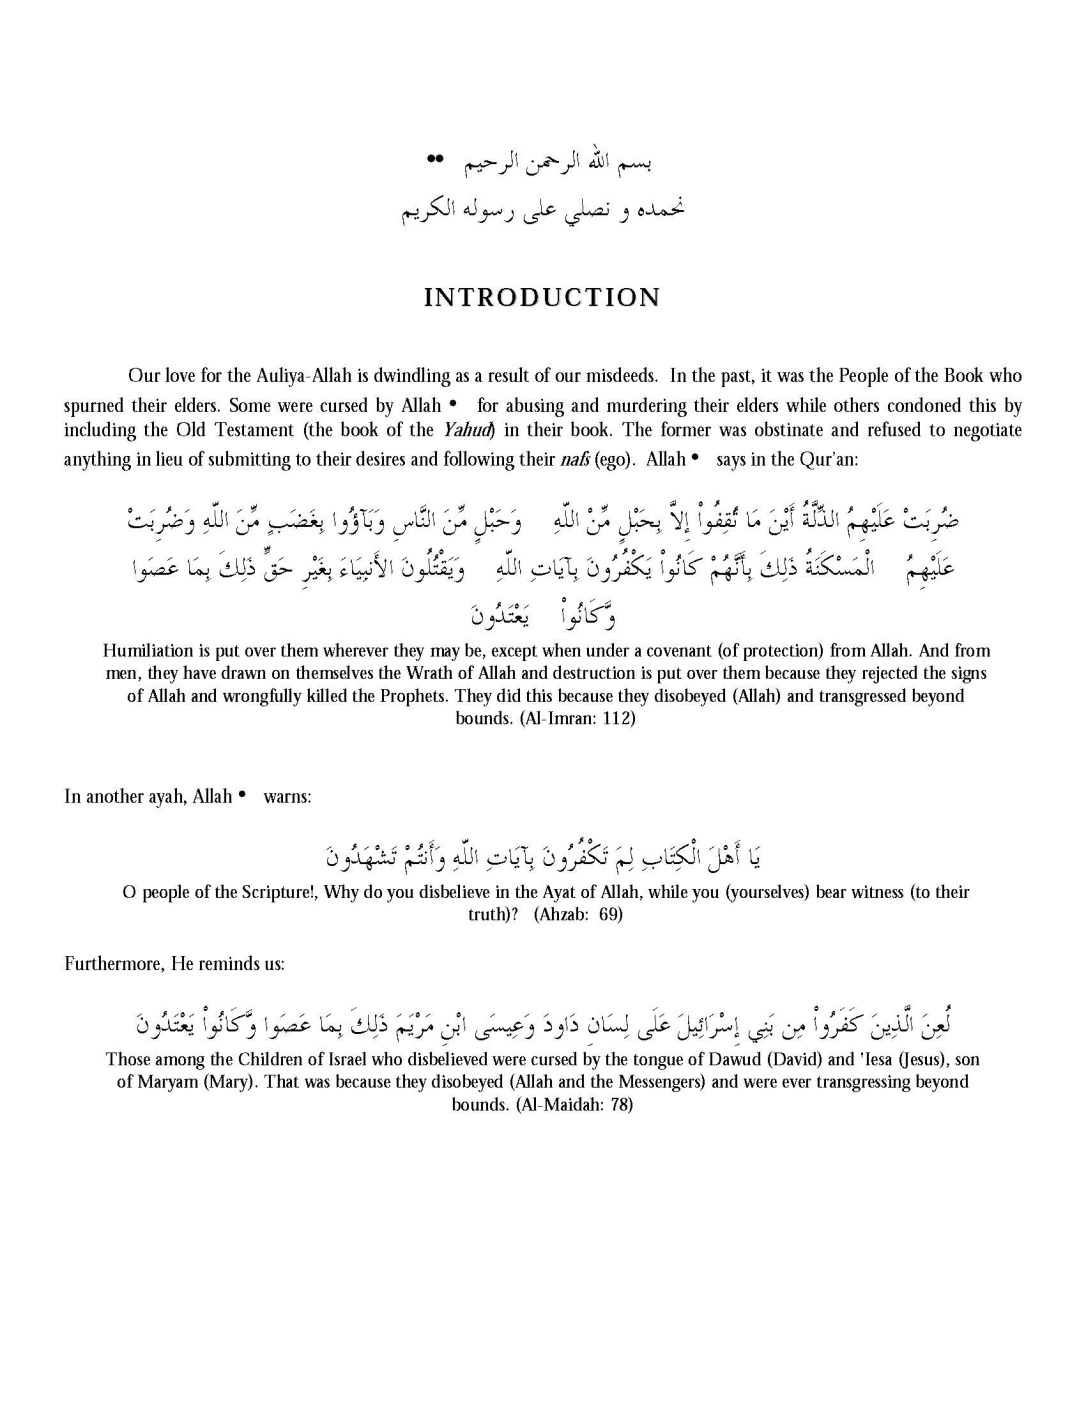 ConsequencesOfDebasingAuliyaAllah_Page_04